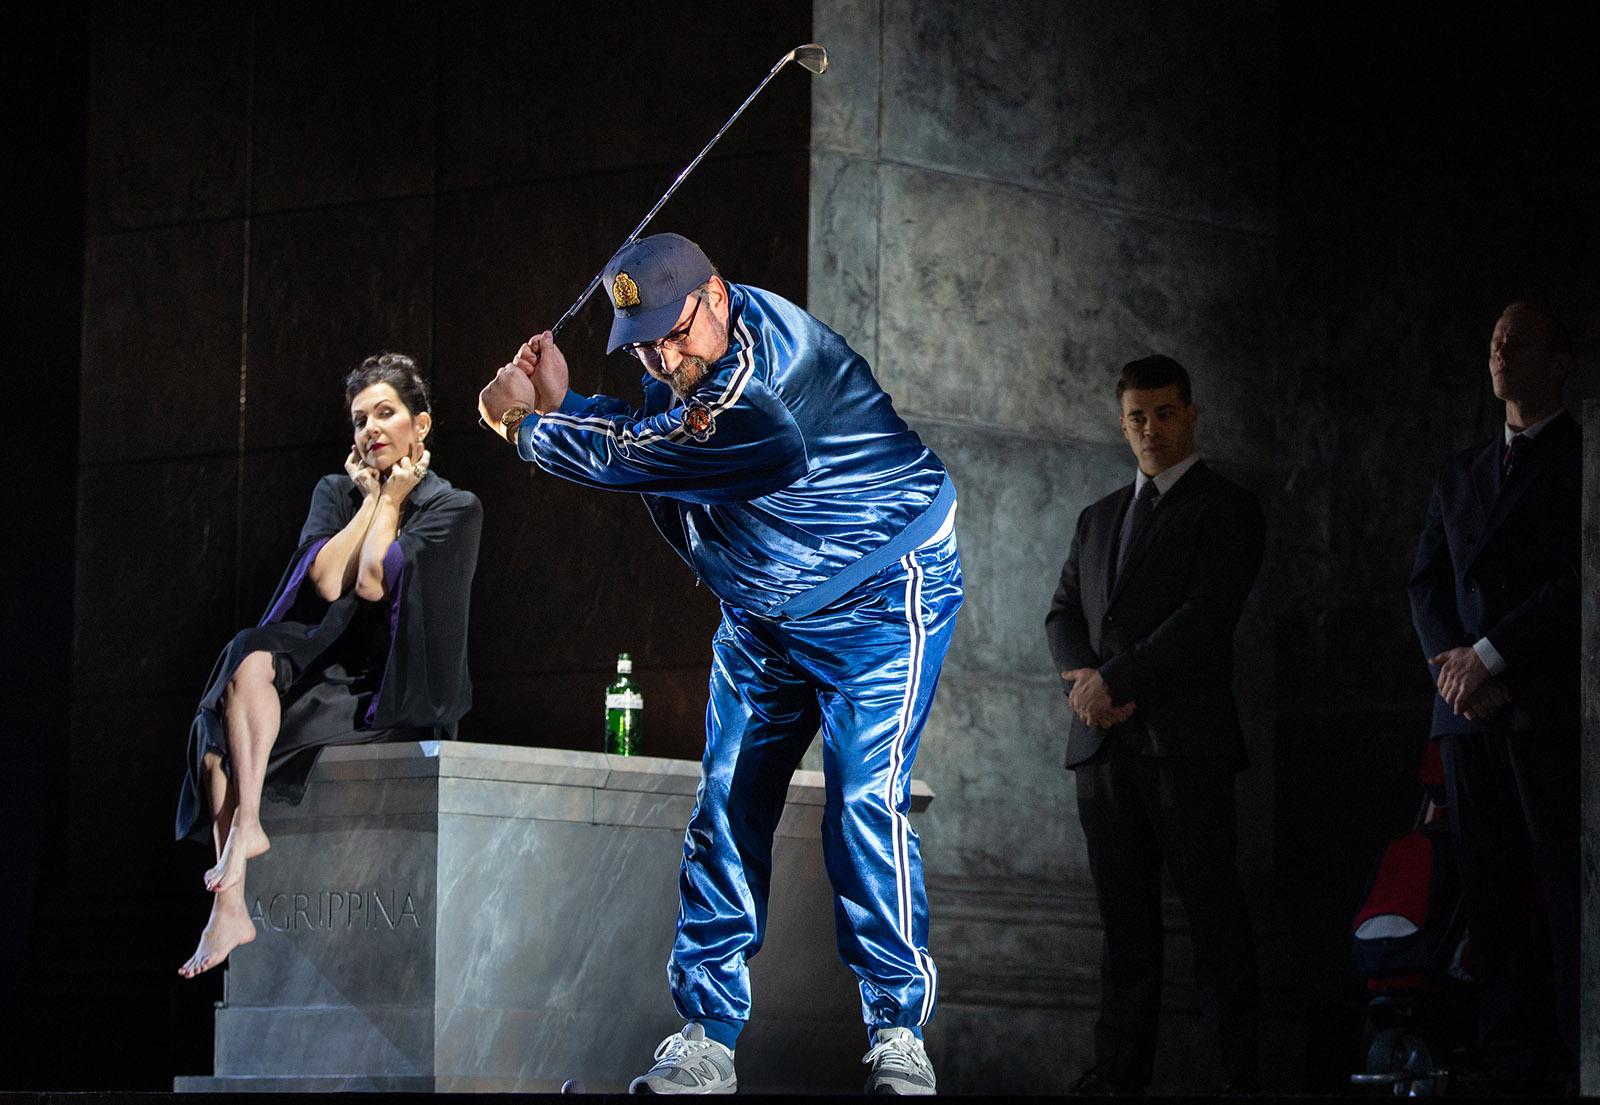 Joyce DiDonato as Agrippina and Matthew Rose as Claudio in Handel's Agrippina at the Metropolitan Opera, New York, 2020